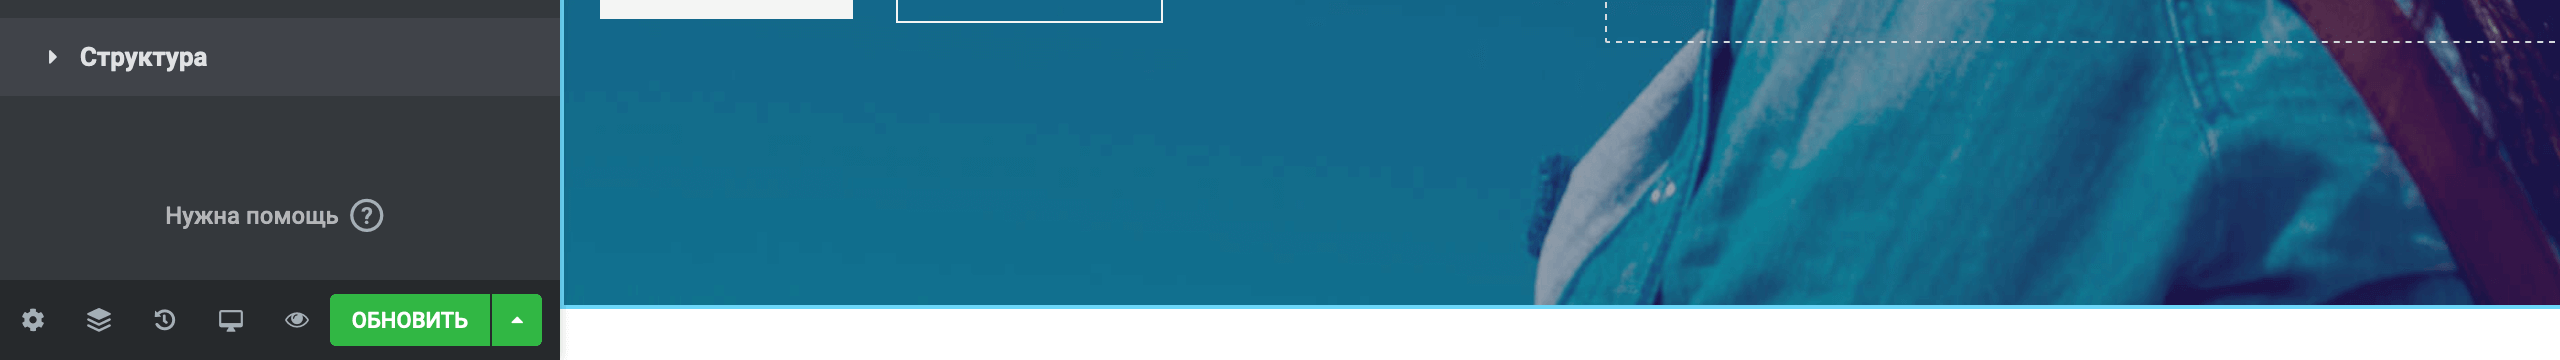 WooCommerce инструкция: кнопки внизу боковой панели Elementor